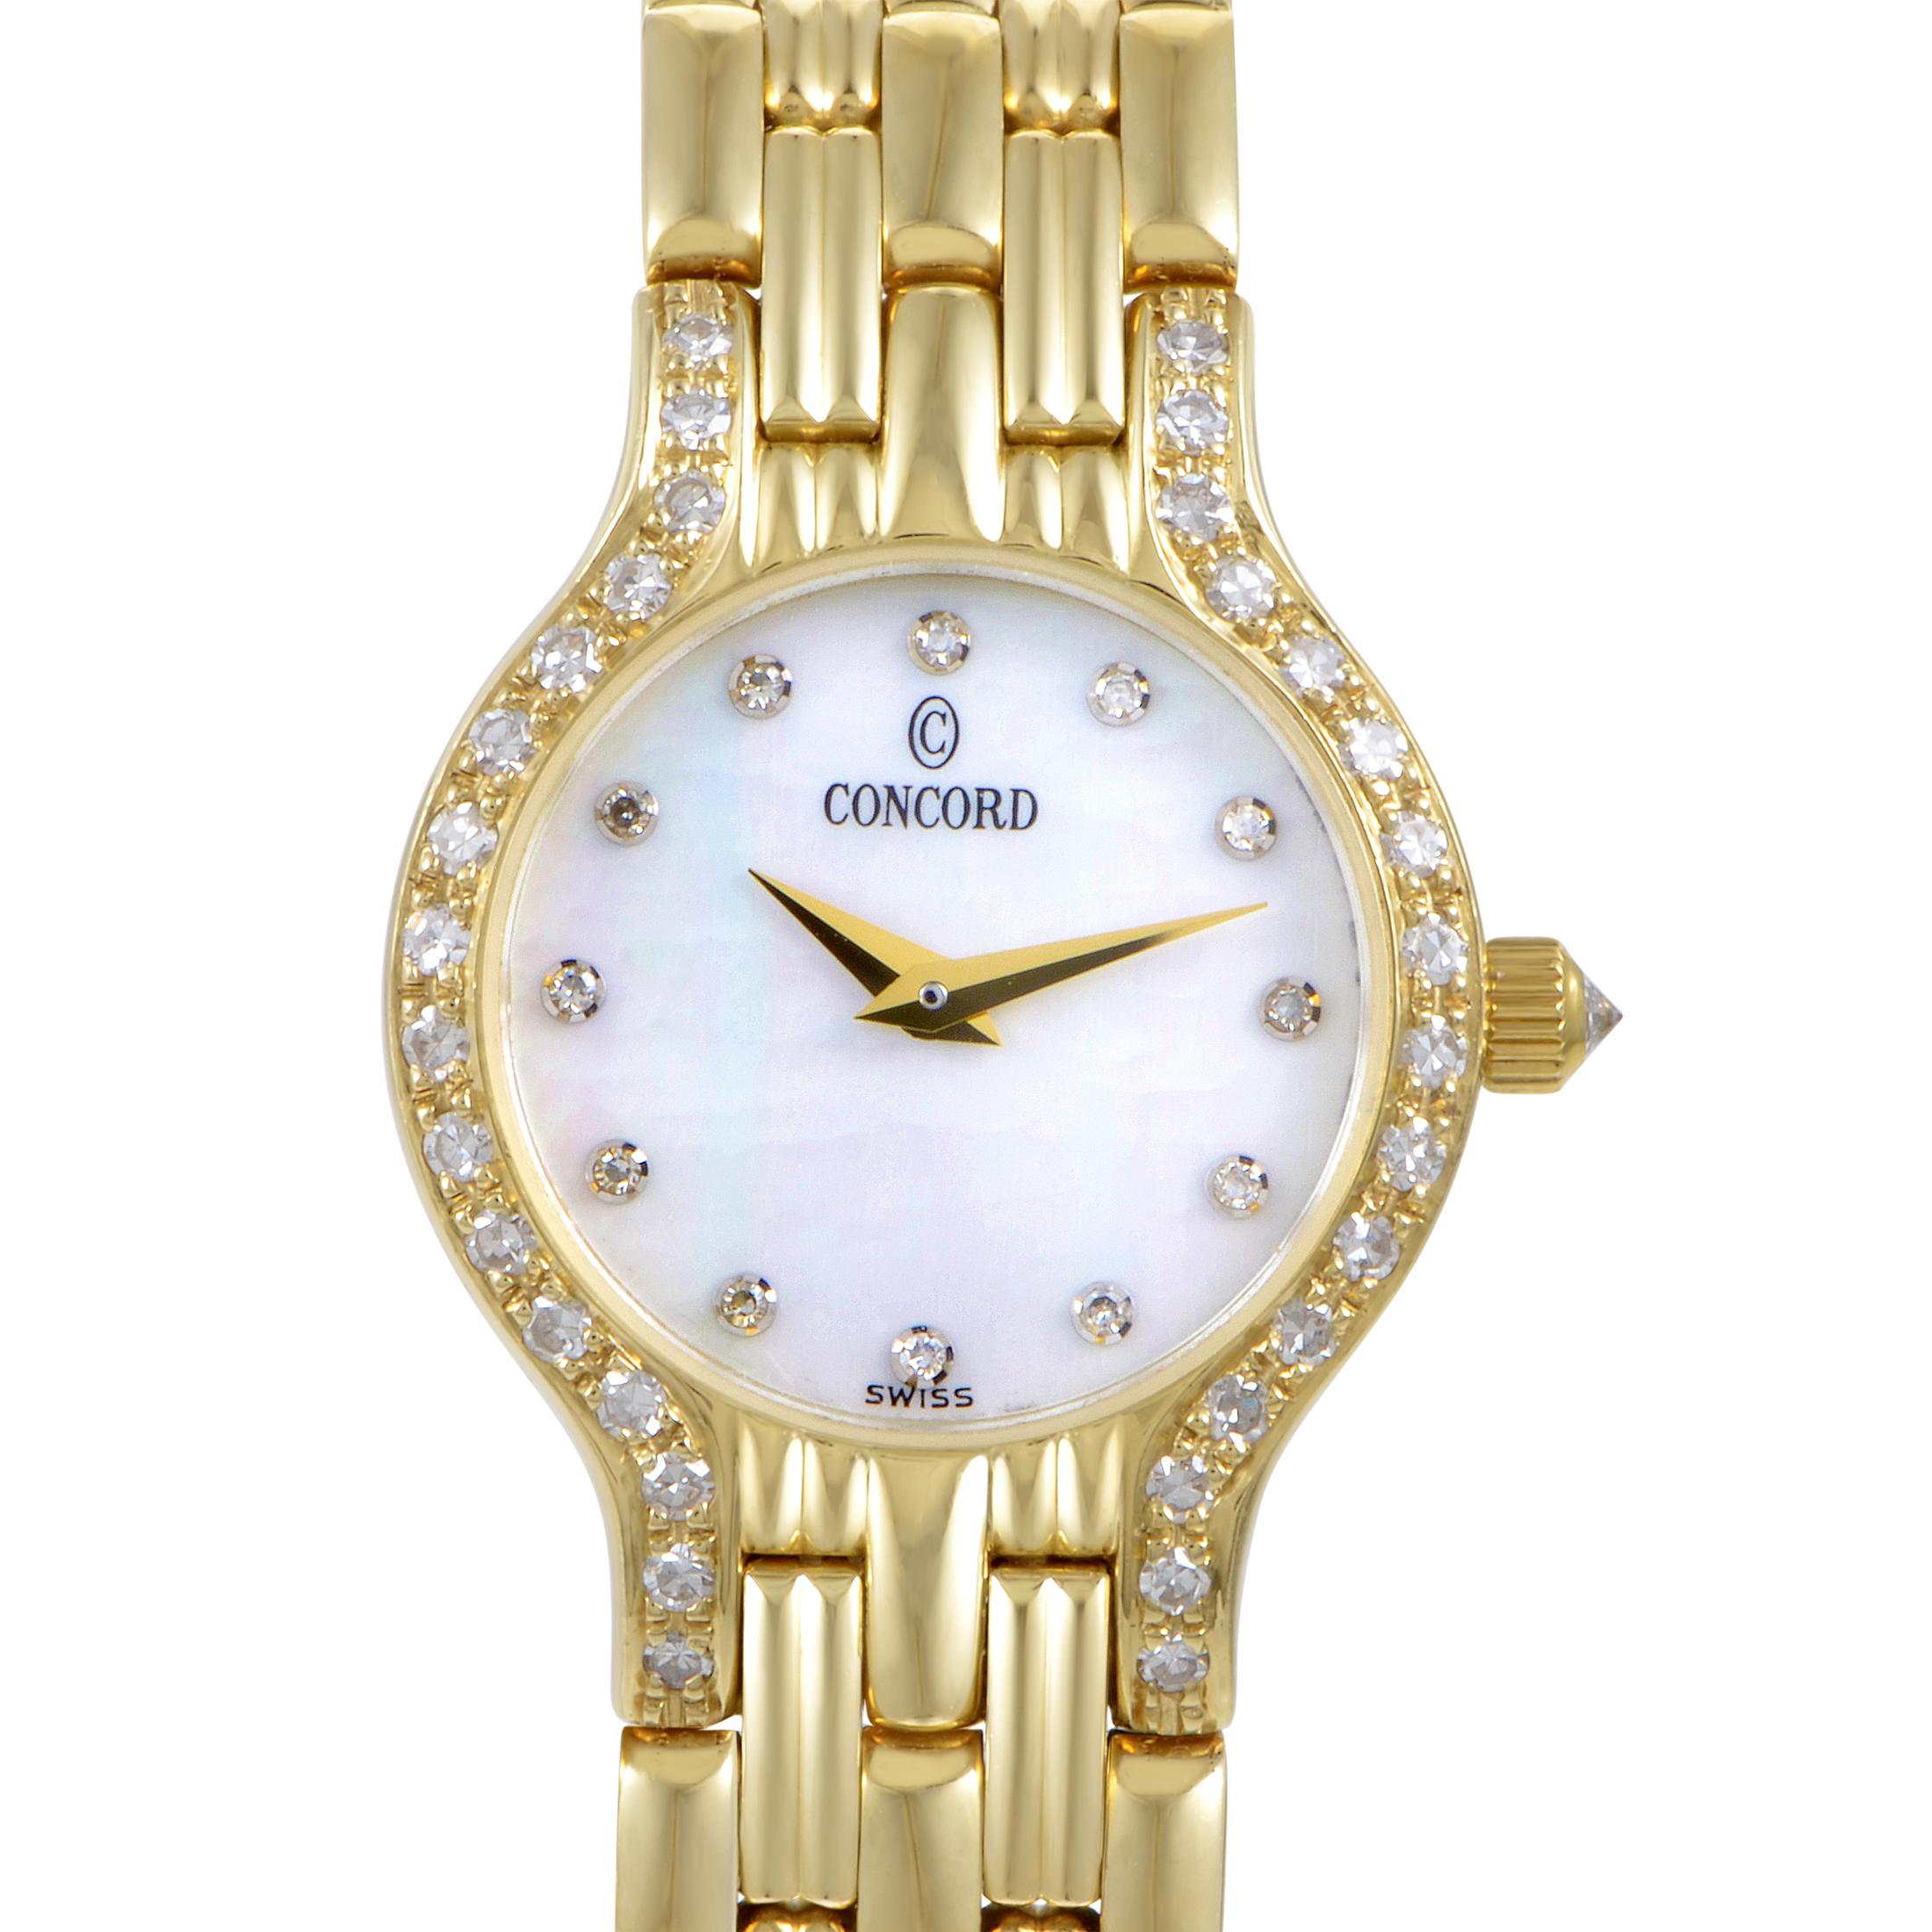 Concord Womens 18K Yellow Gold Diamond Quartz Watch